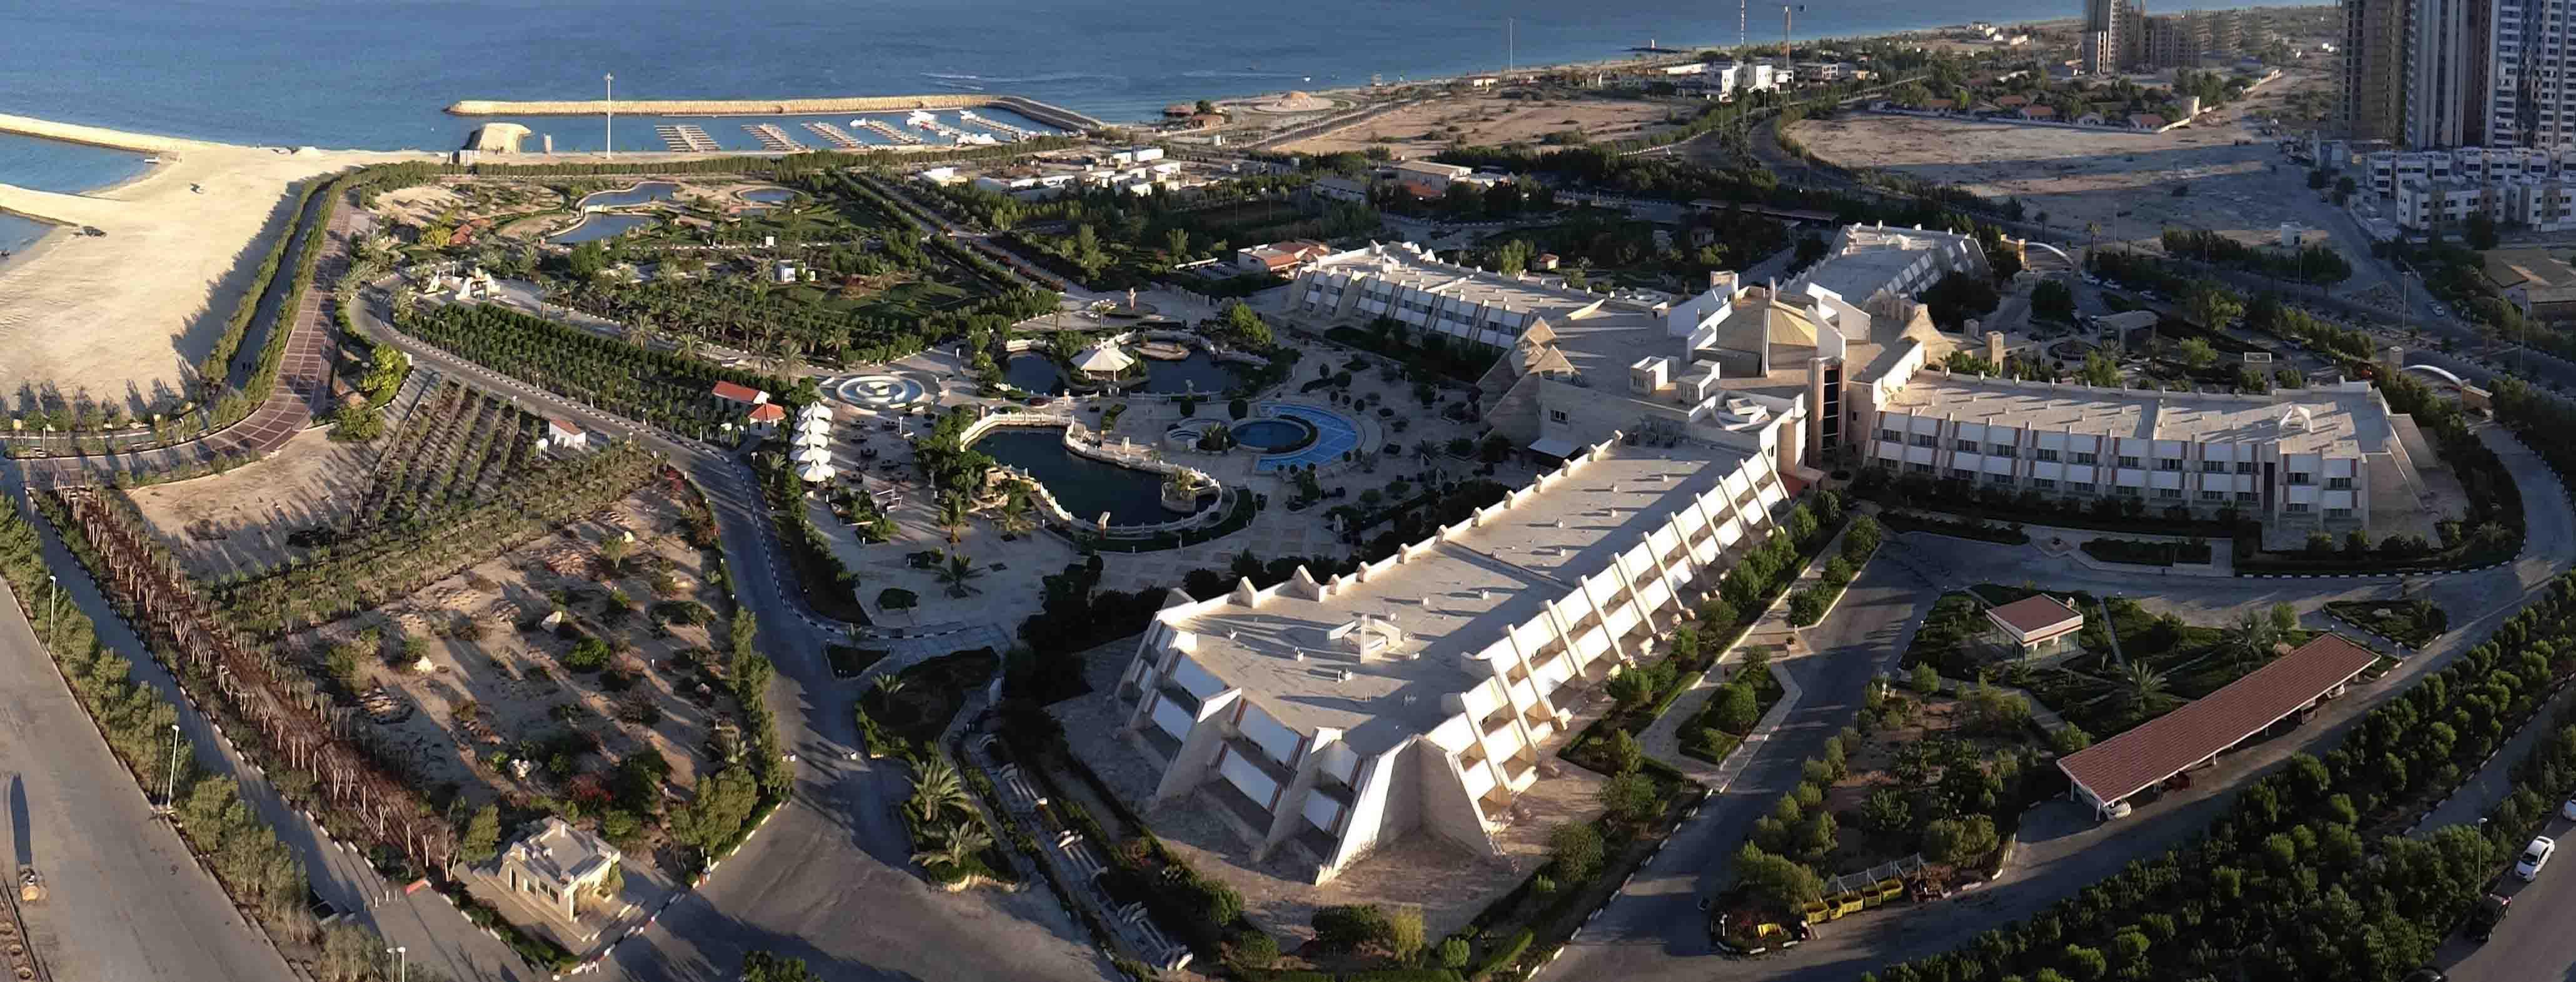 Photo of هتل مارینا پارک کیش | Marina park Hotel